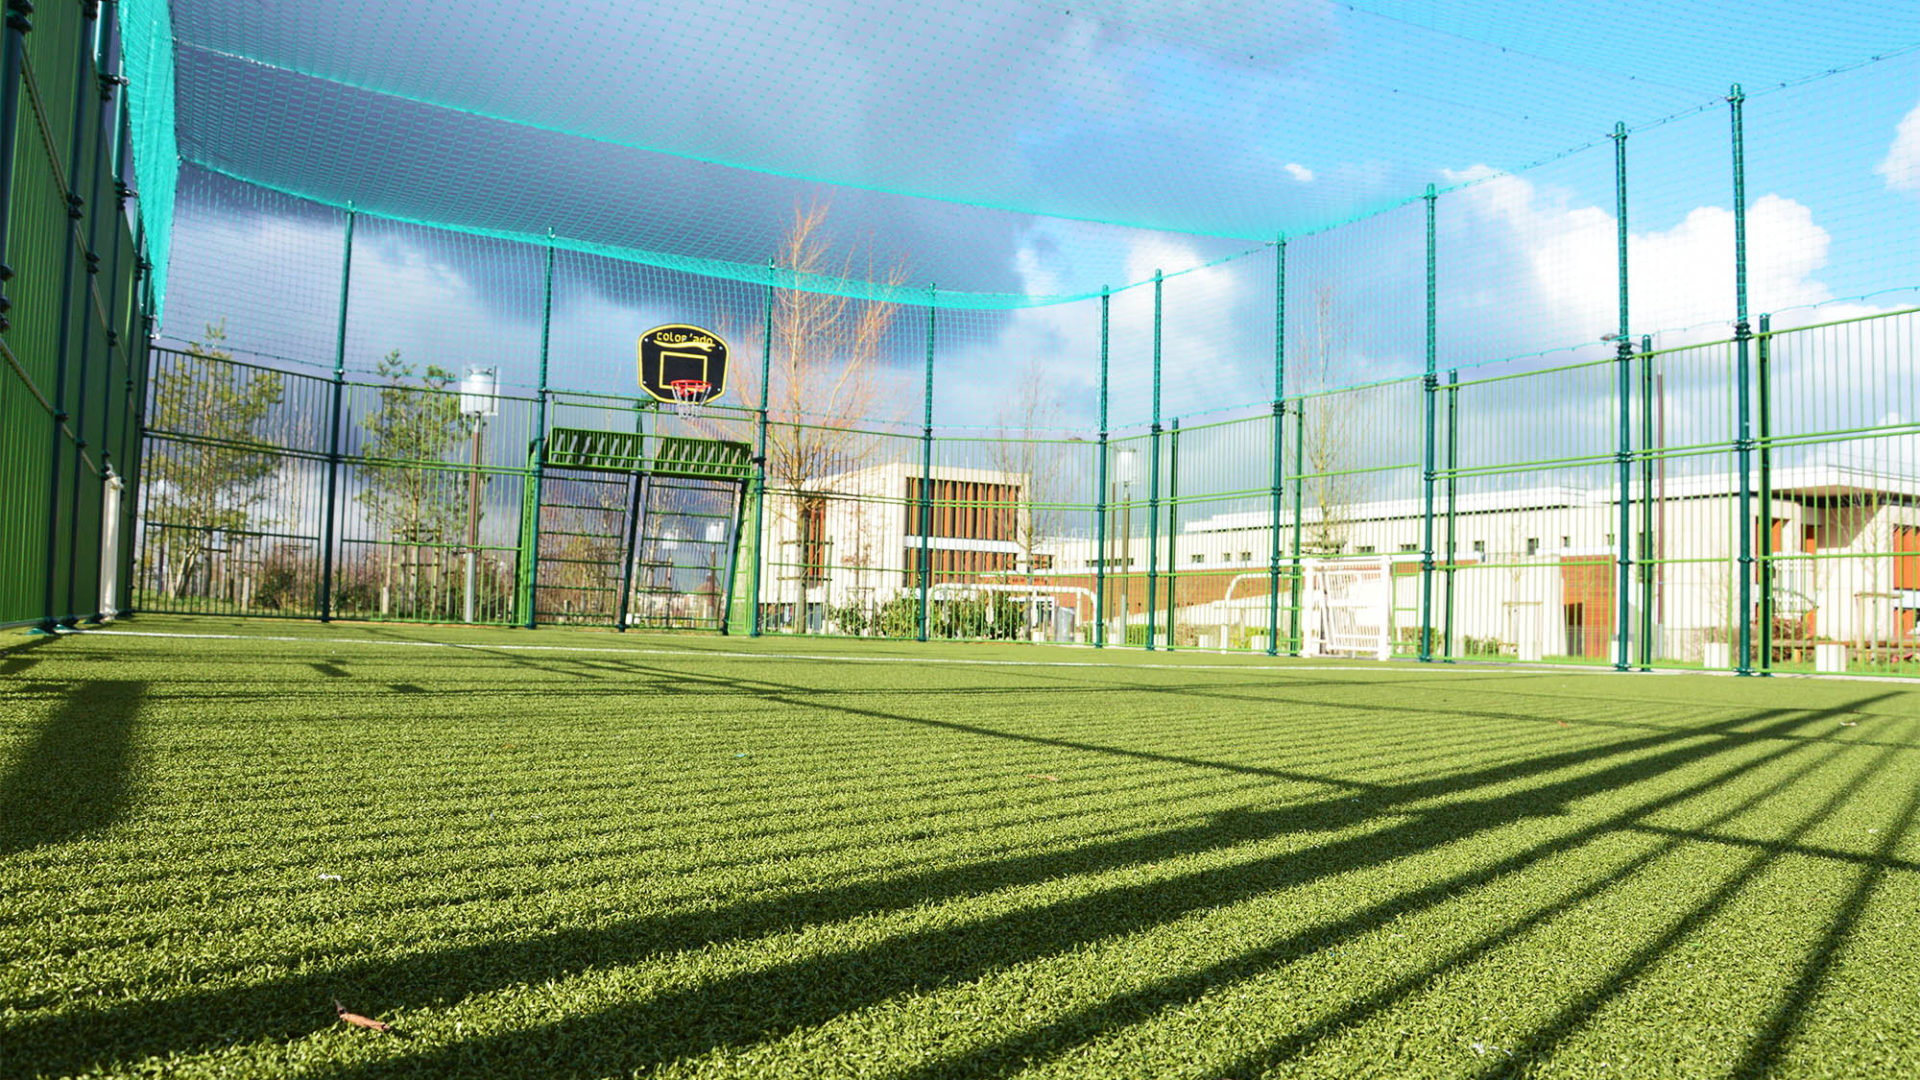 Terrain Multisport Foot Basket à Bussy-Saint-Georges Stade Sycomore